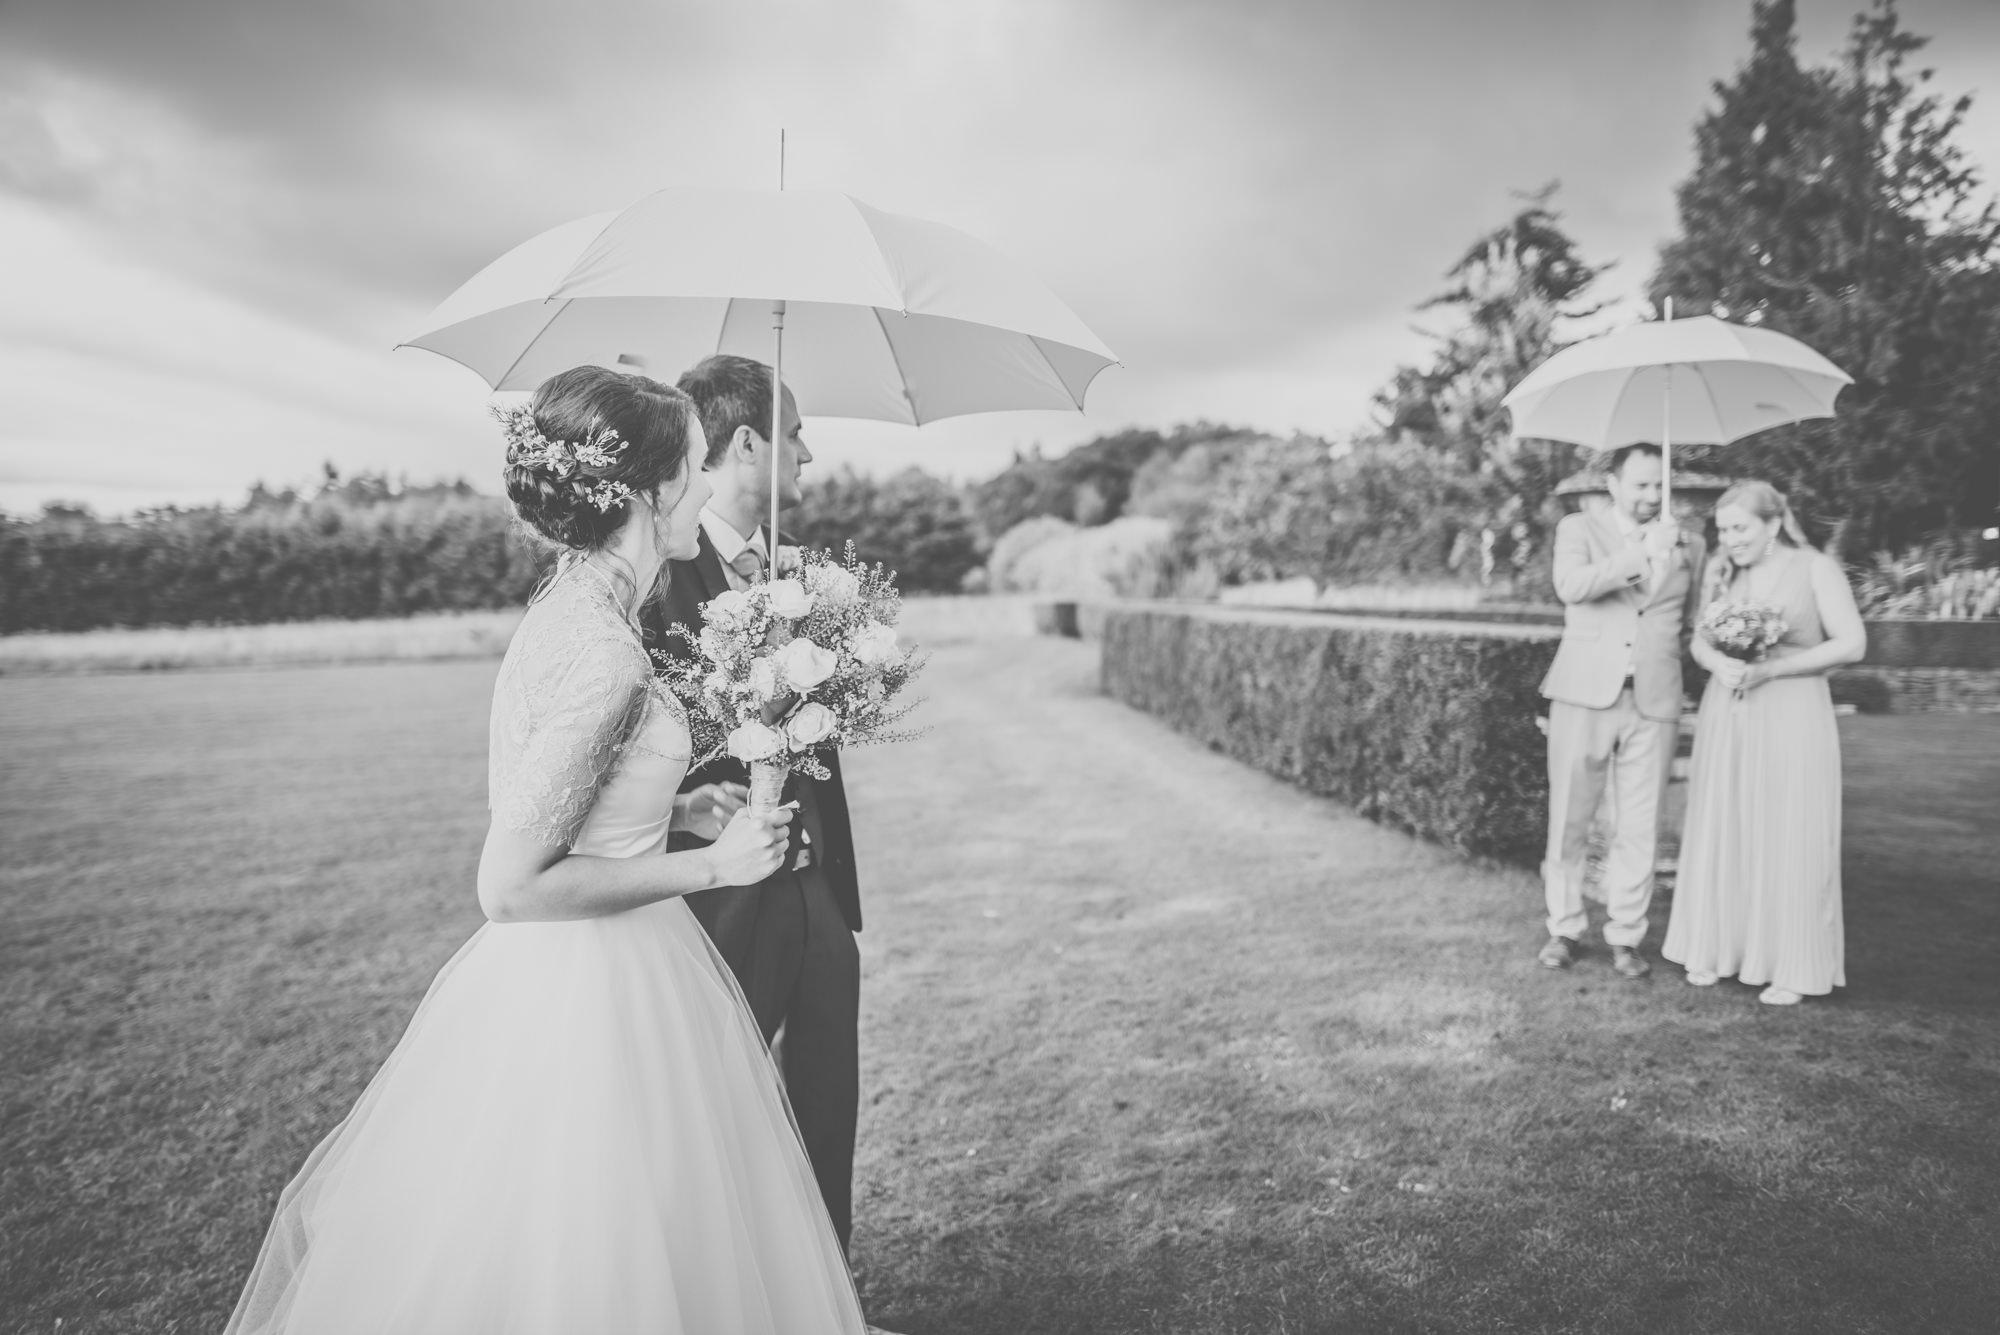 Charisse-and-James-wedding-in-Cain-Manor-Venue-Hampshire-Manu-Mendoza-Wedding-Photography-381.jpg